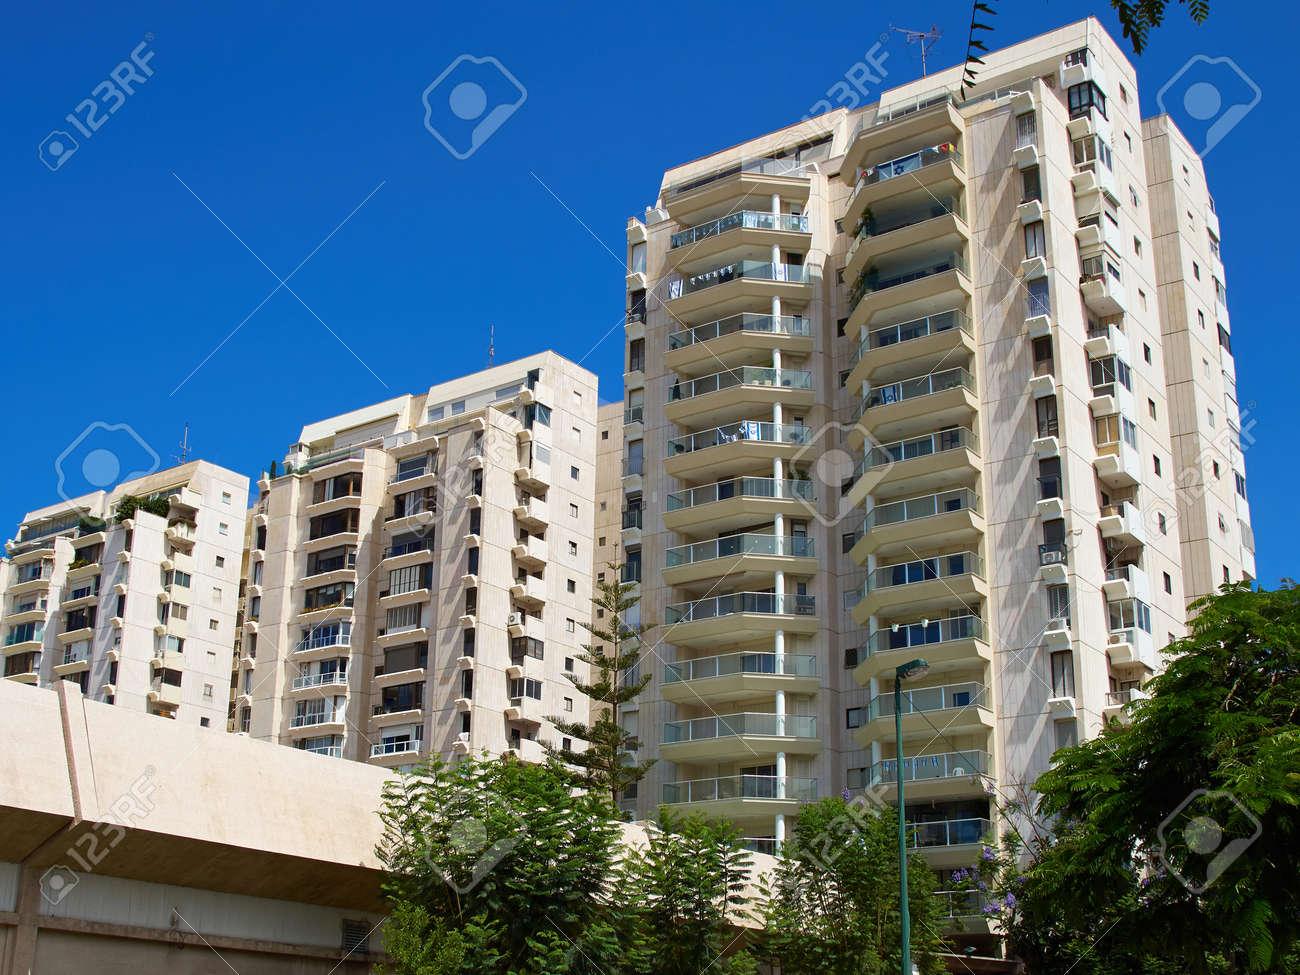 Modern design luxurious executive apartments city condominium building - 58920810